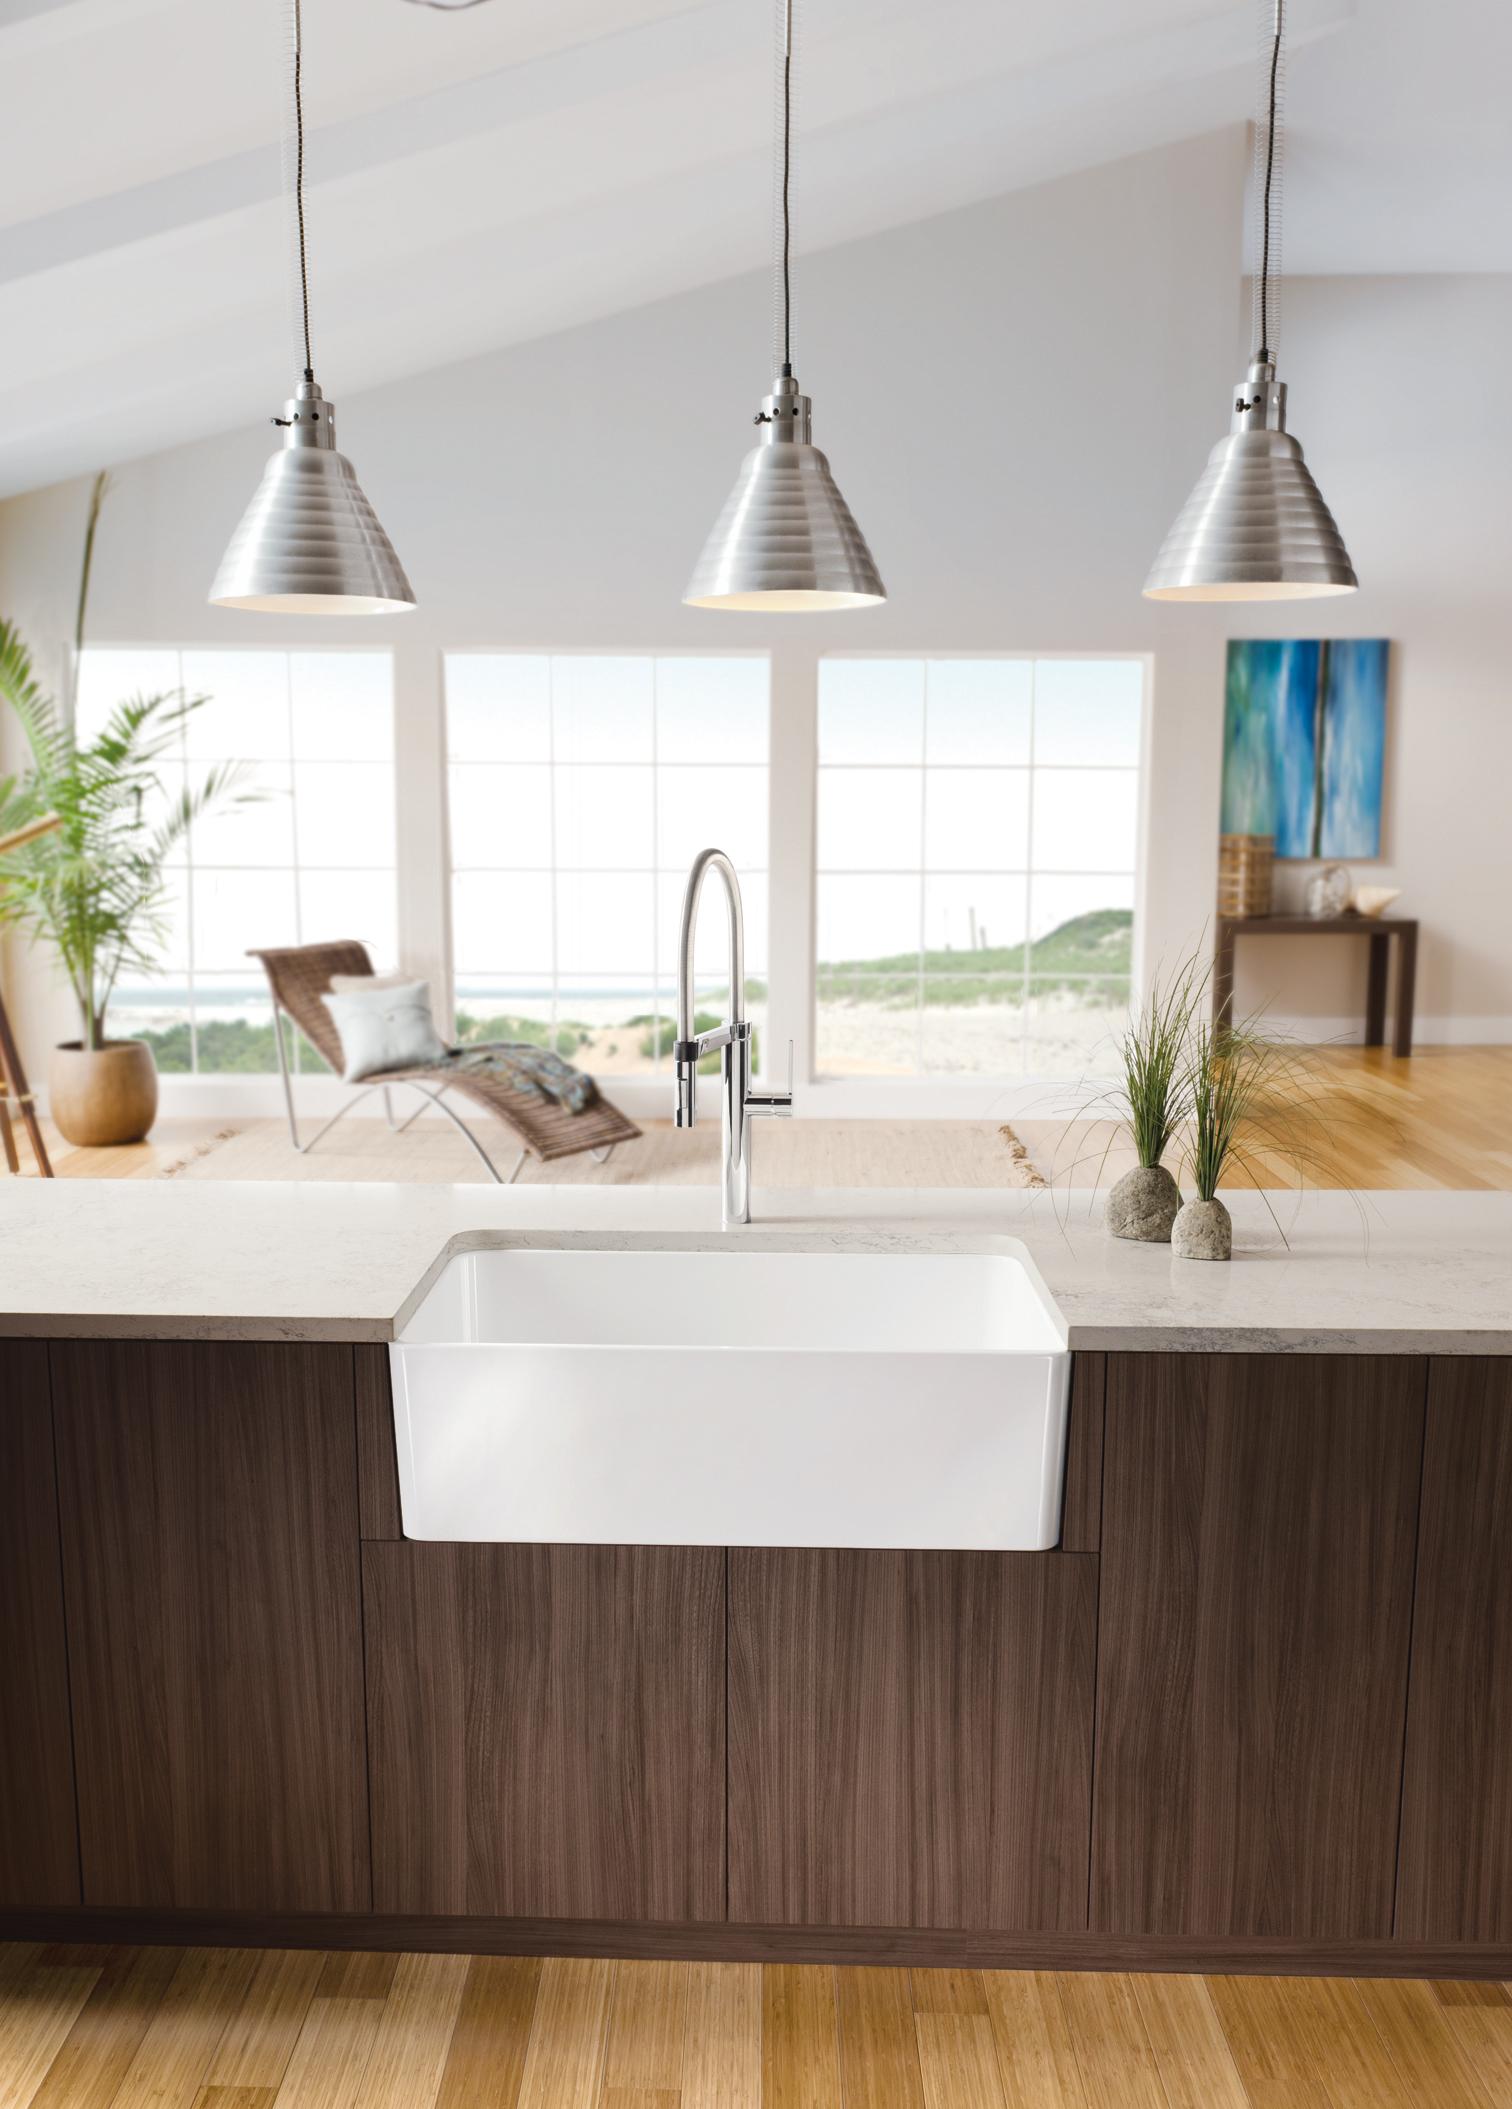 prweb apron front kitchen sink BLANCO CERANA Image 1